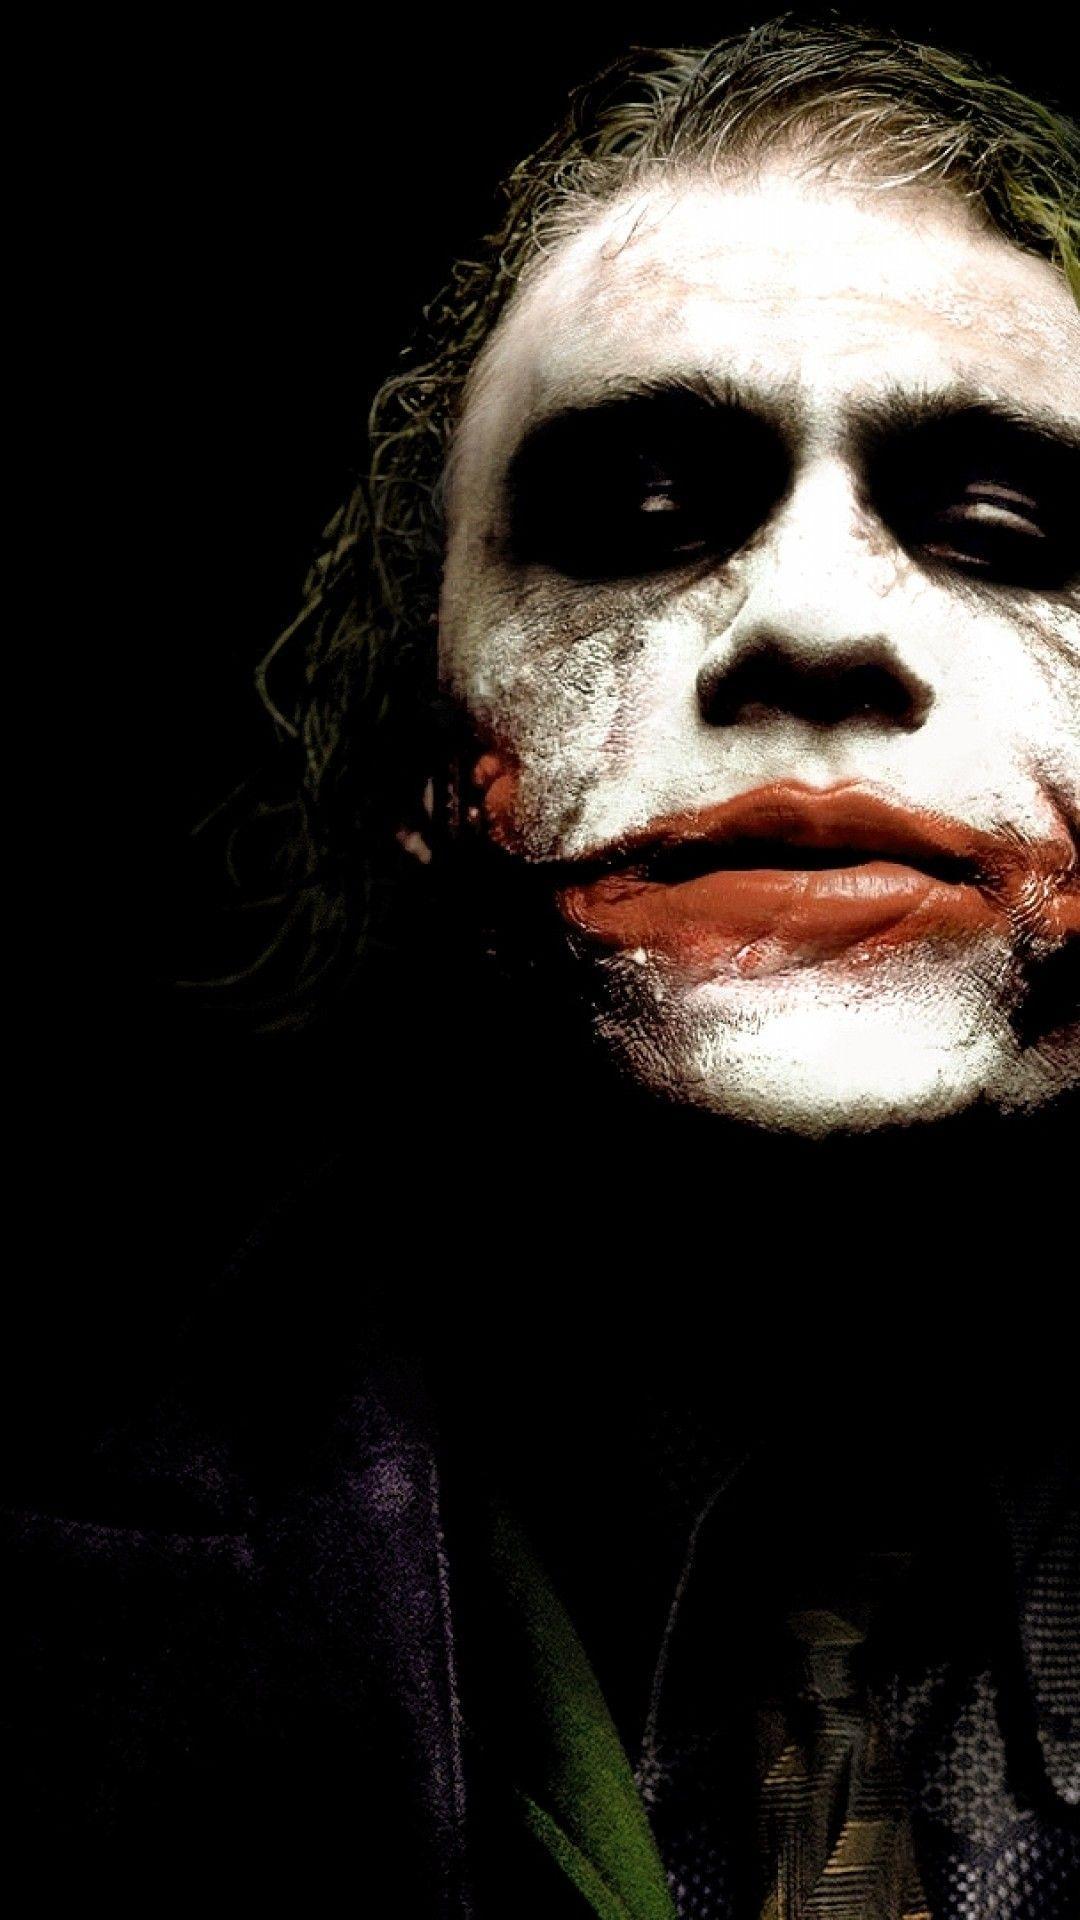 Heath Ledger Joker Iphone Wallpapers Top Free Heath Ledger